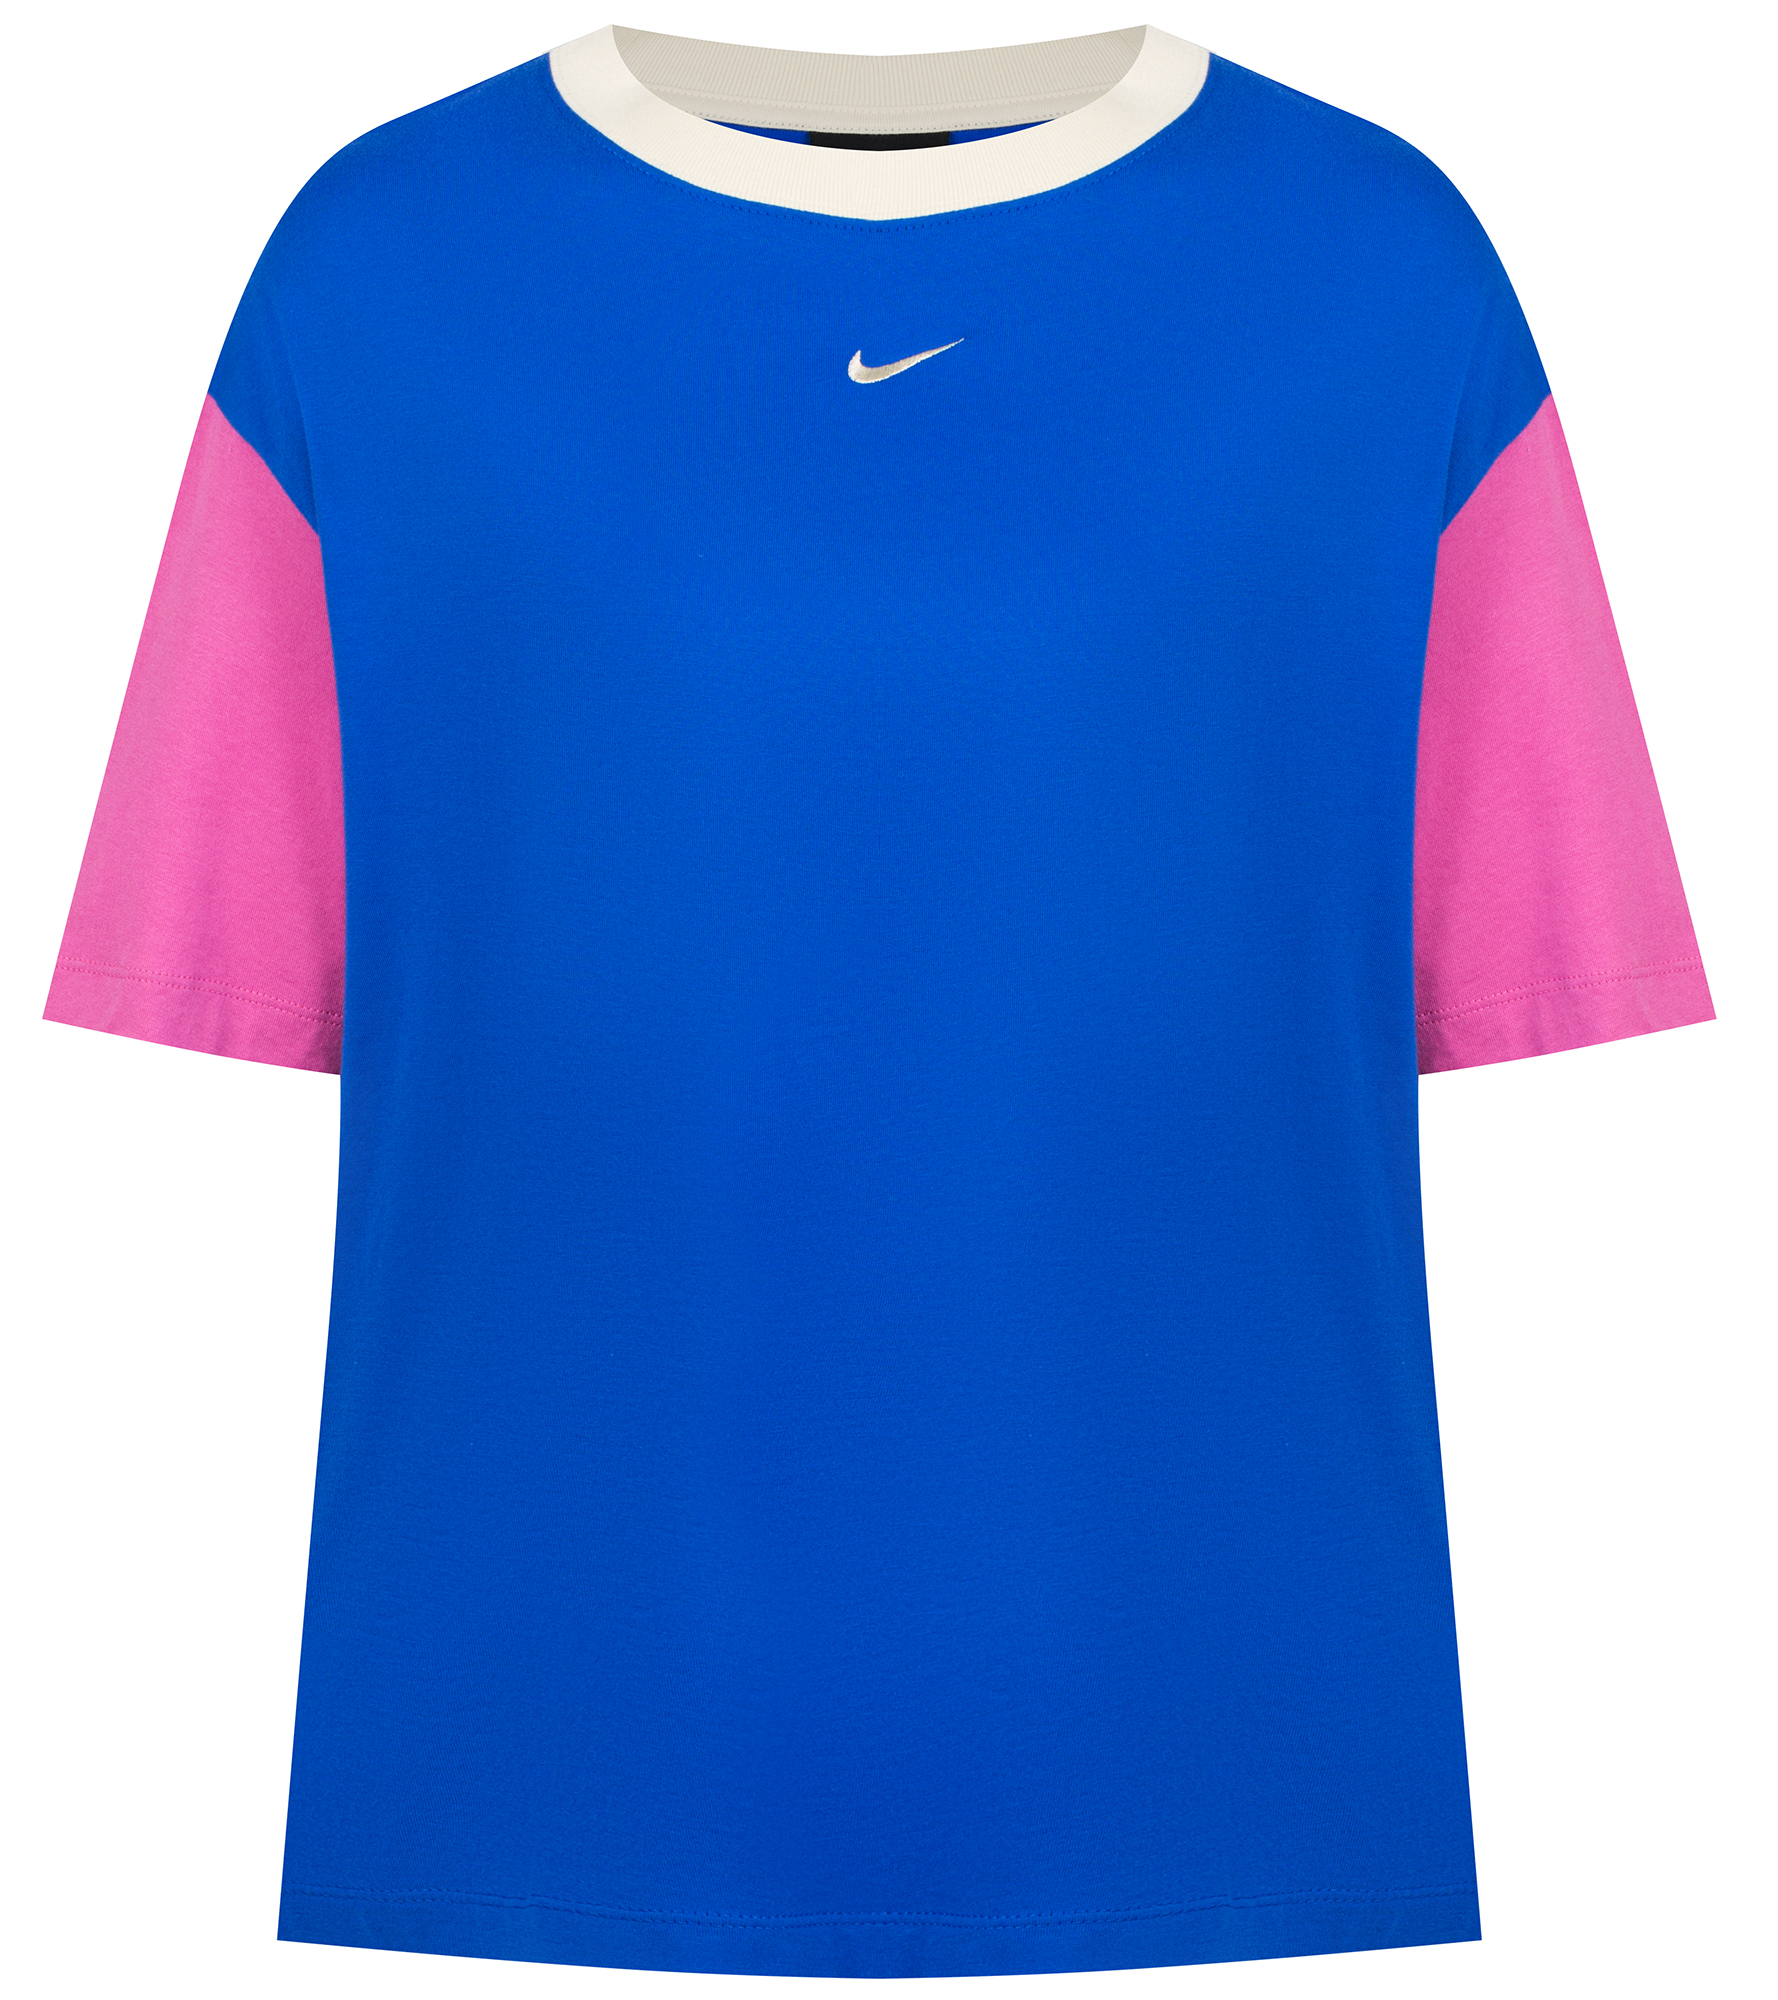 Nike Футболка женская Nike Sportswear Essentials, размер 52-54 цена